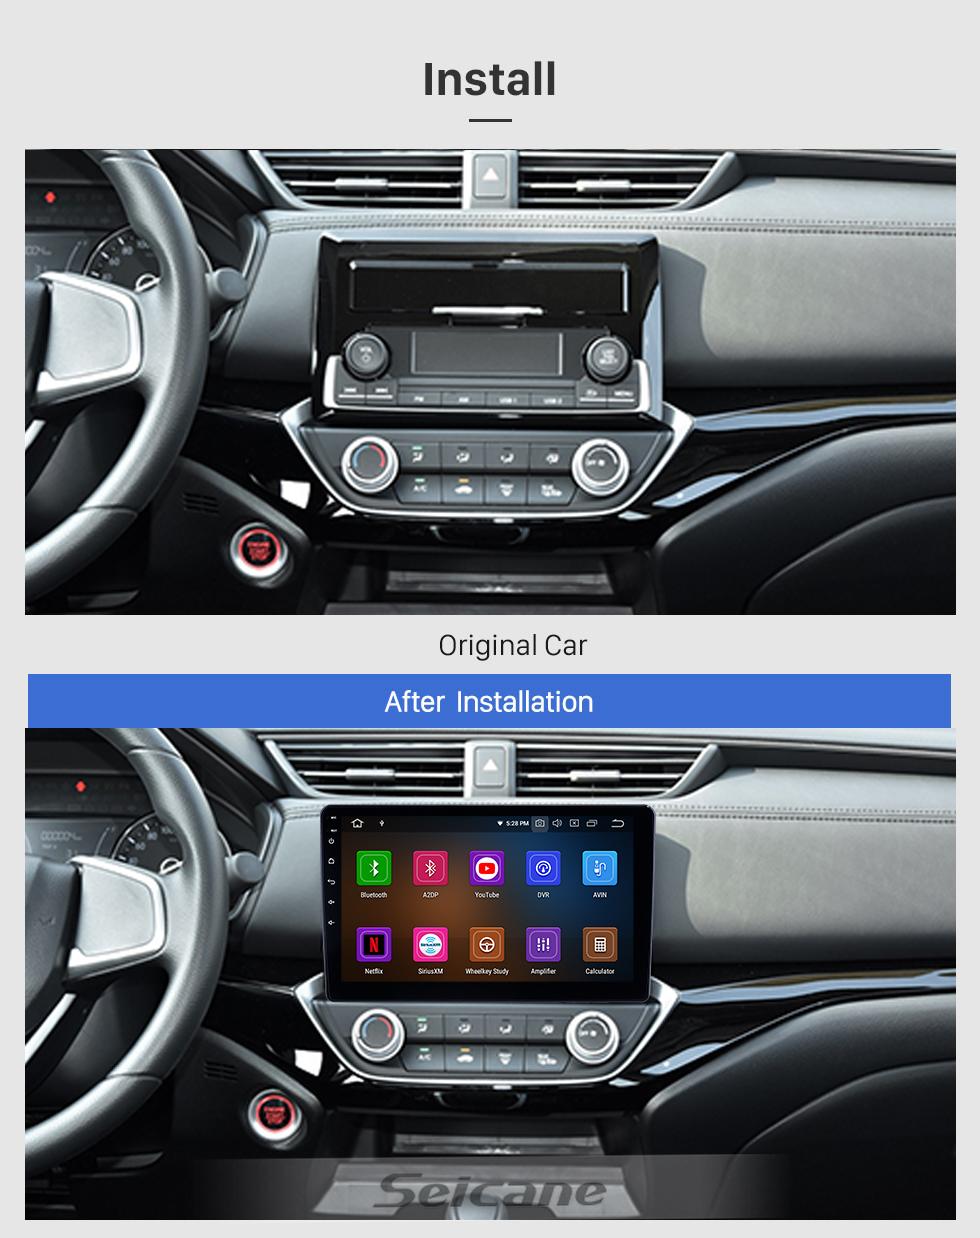 Seicane 10.1 pulgadas 2018-2019 Honda Crider Android 10.0 Navegación GPS Radio Bluetooth HD Pantalla táctil AUX USB WIFI Carplay ayuda OBD2 1080P